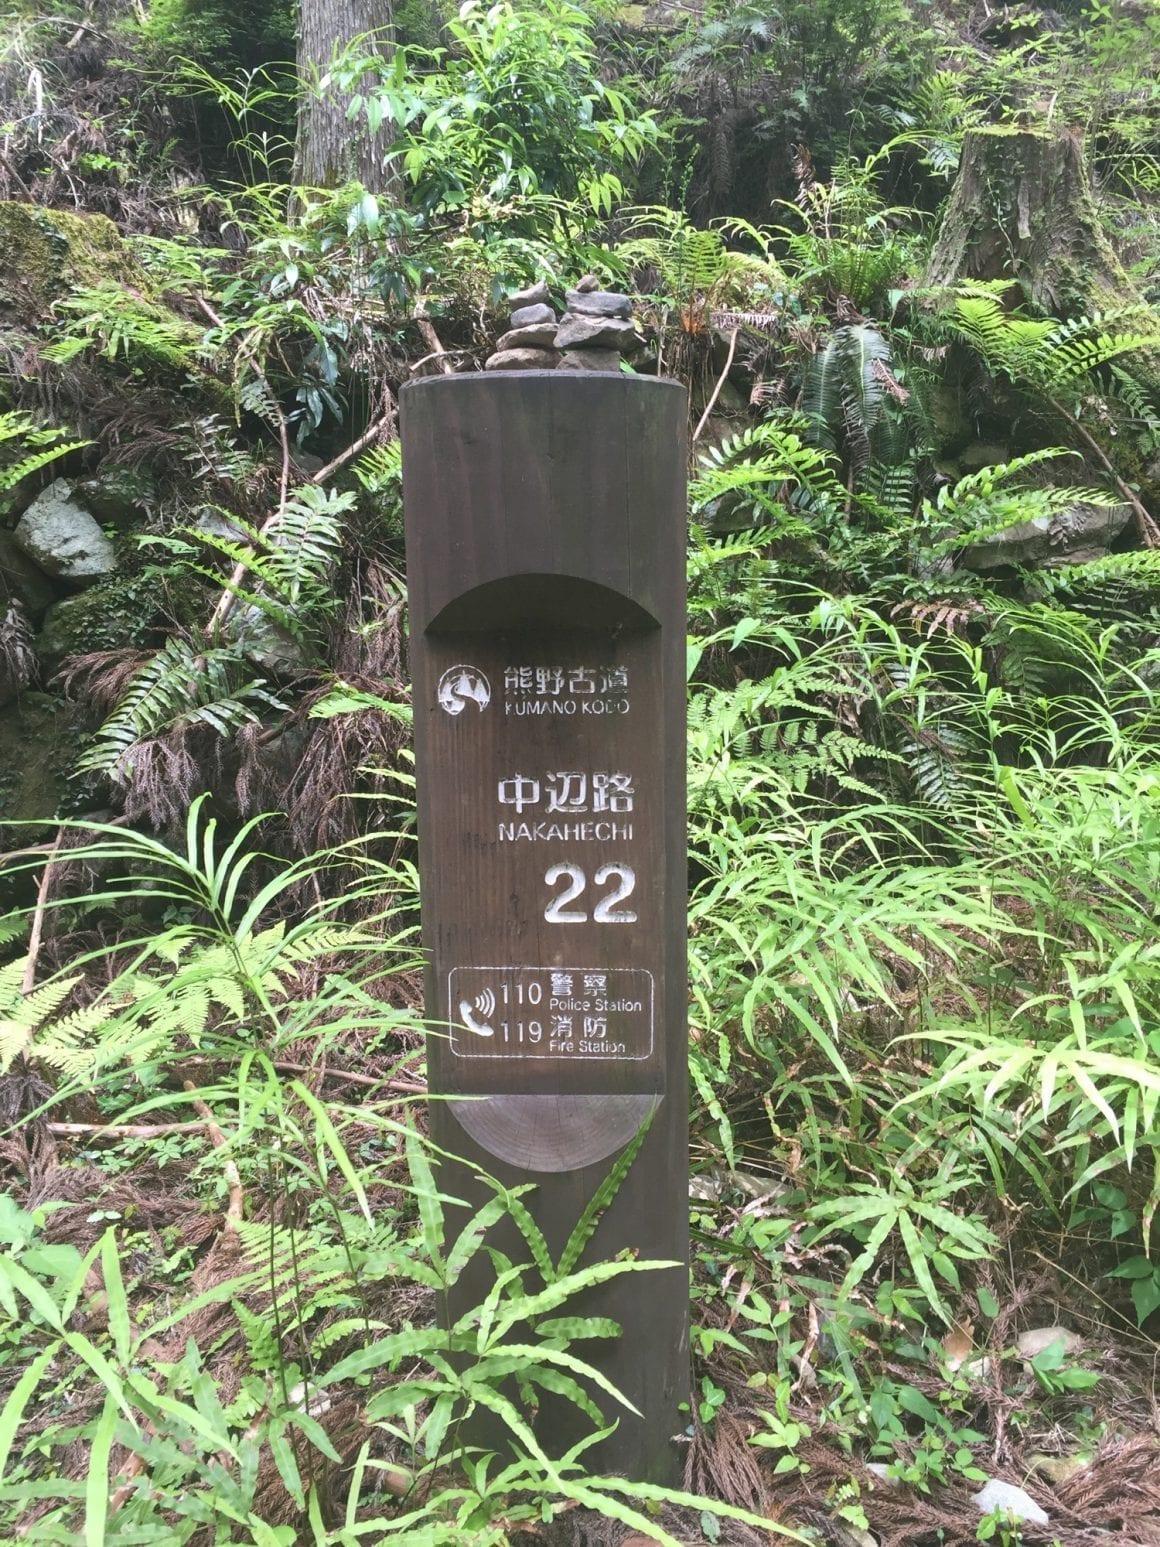 Kumano Kodo Typical Sign